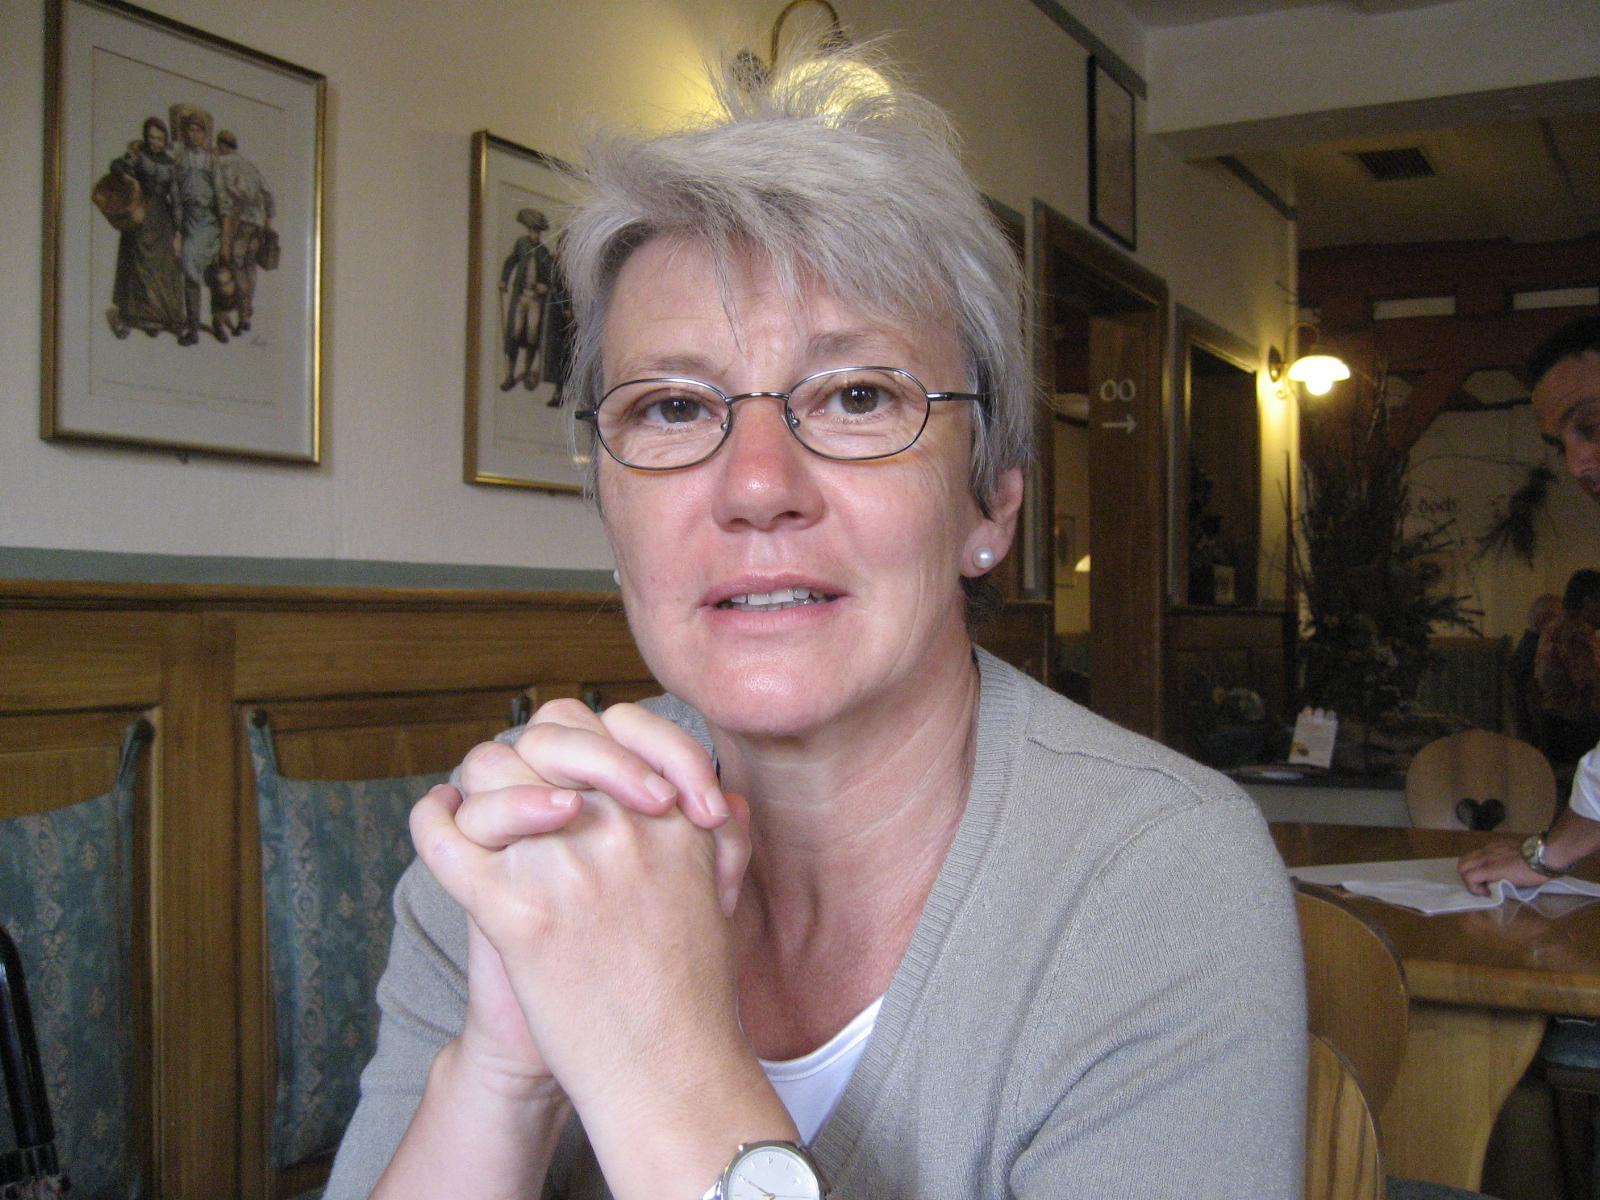 Heidrun Buxmann-Hauke